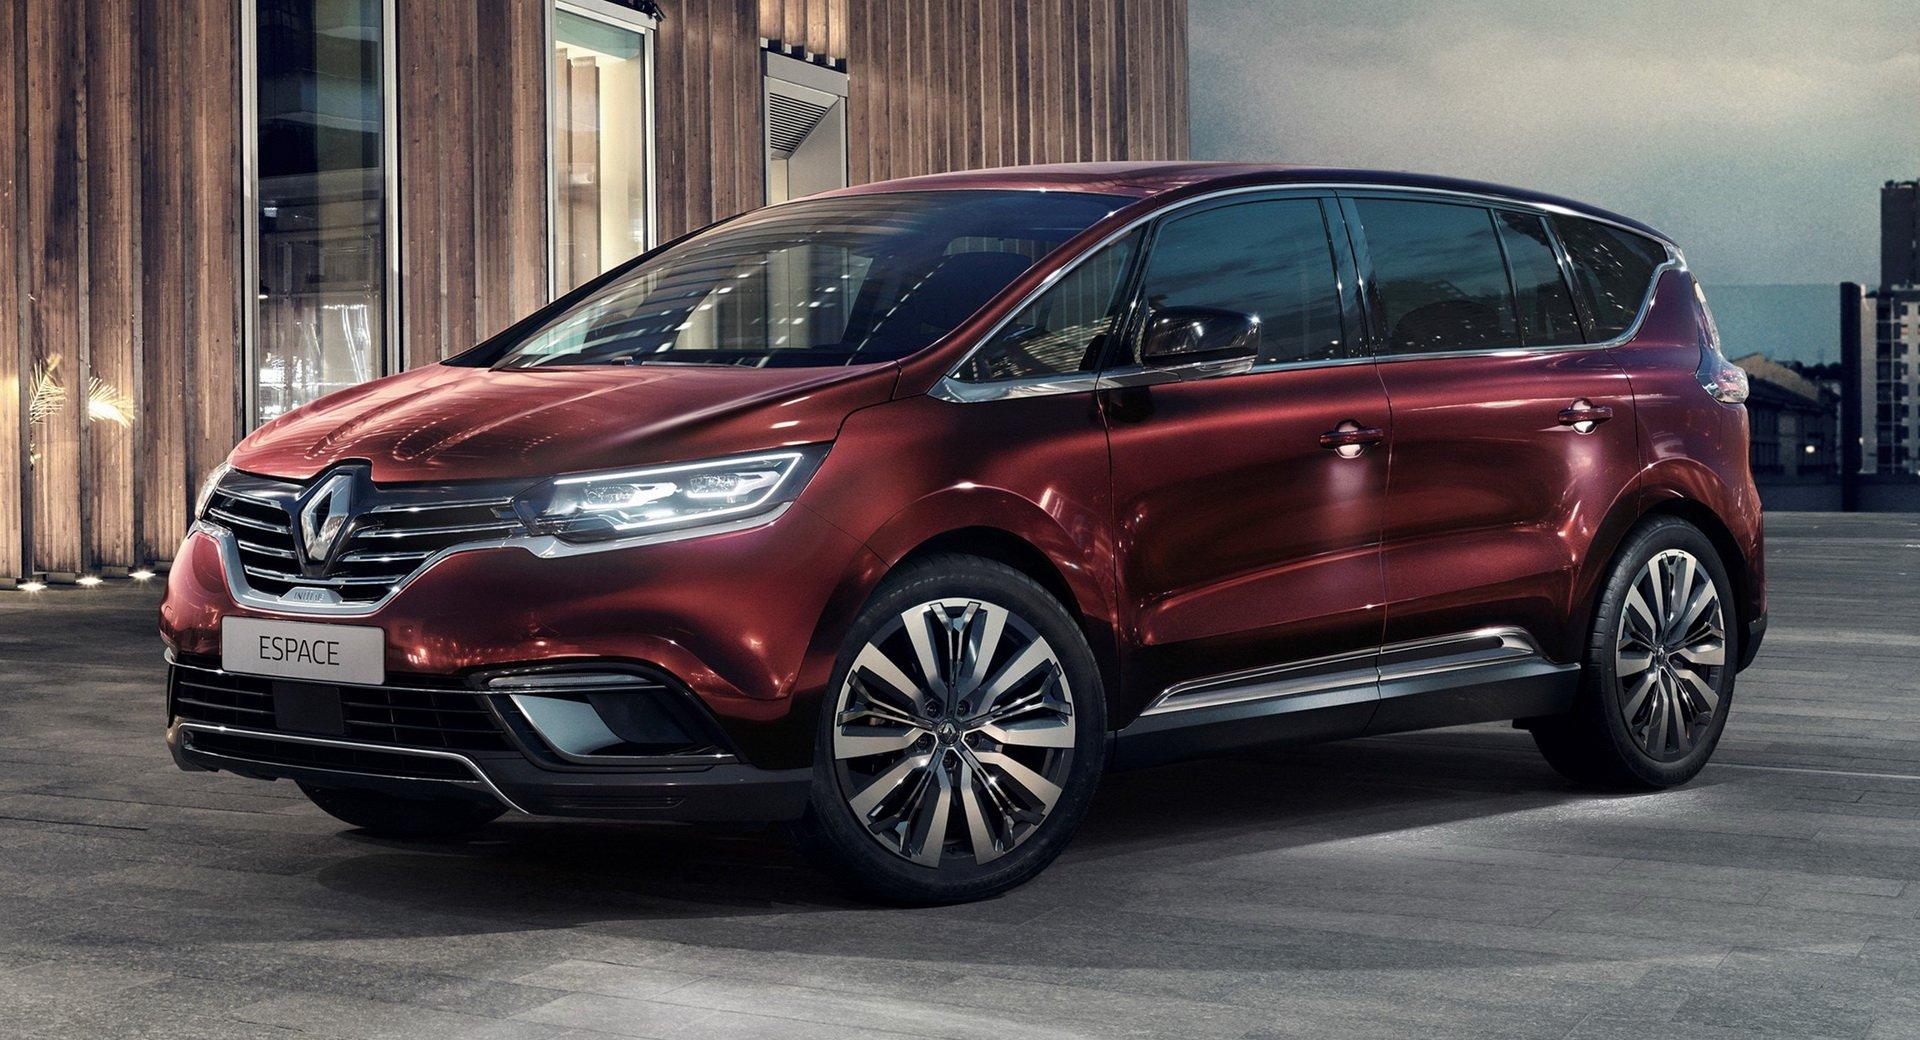 2020-Renault-Espace-01